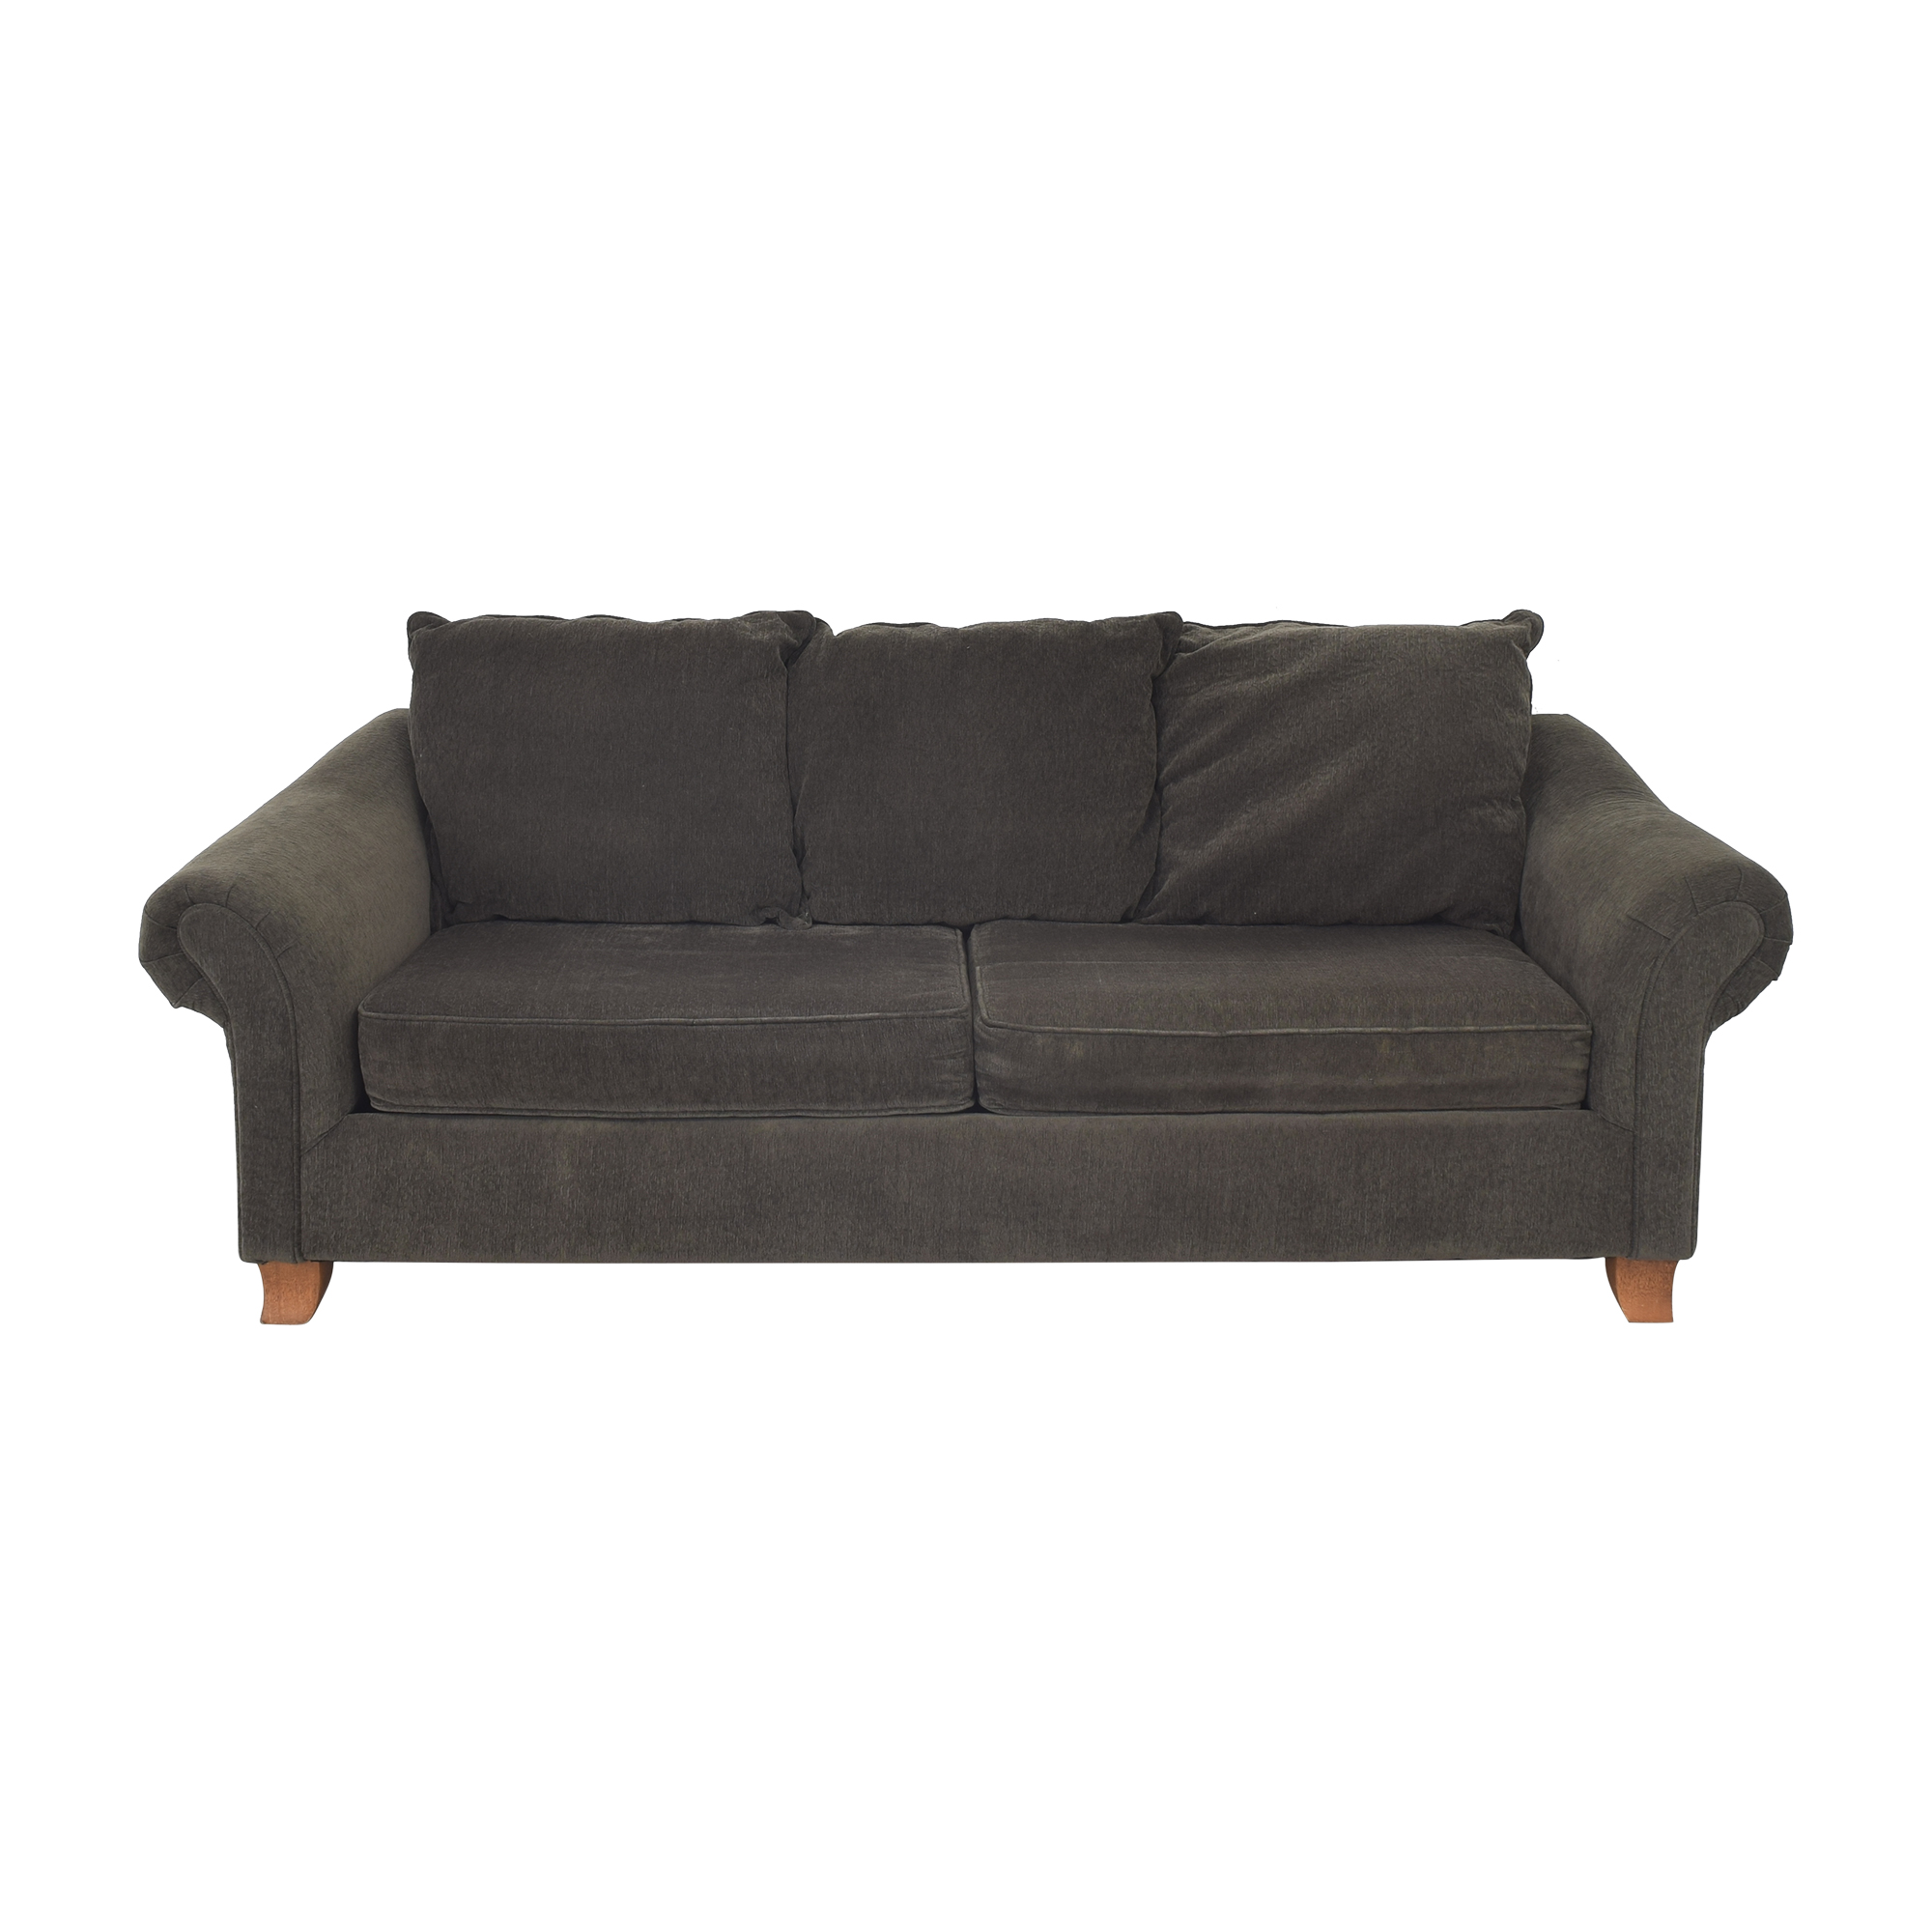 Hughes Furniture Hughes Furniture Curved Arm Sofa Classic Sofas